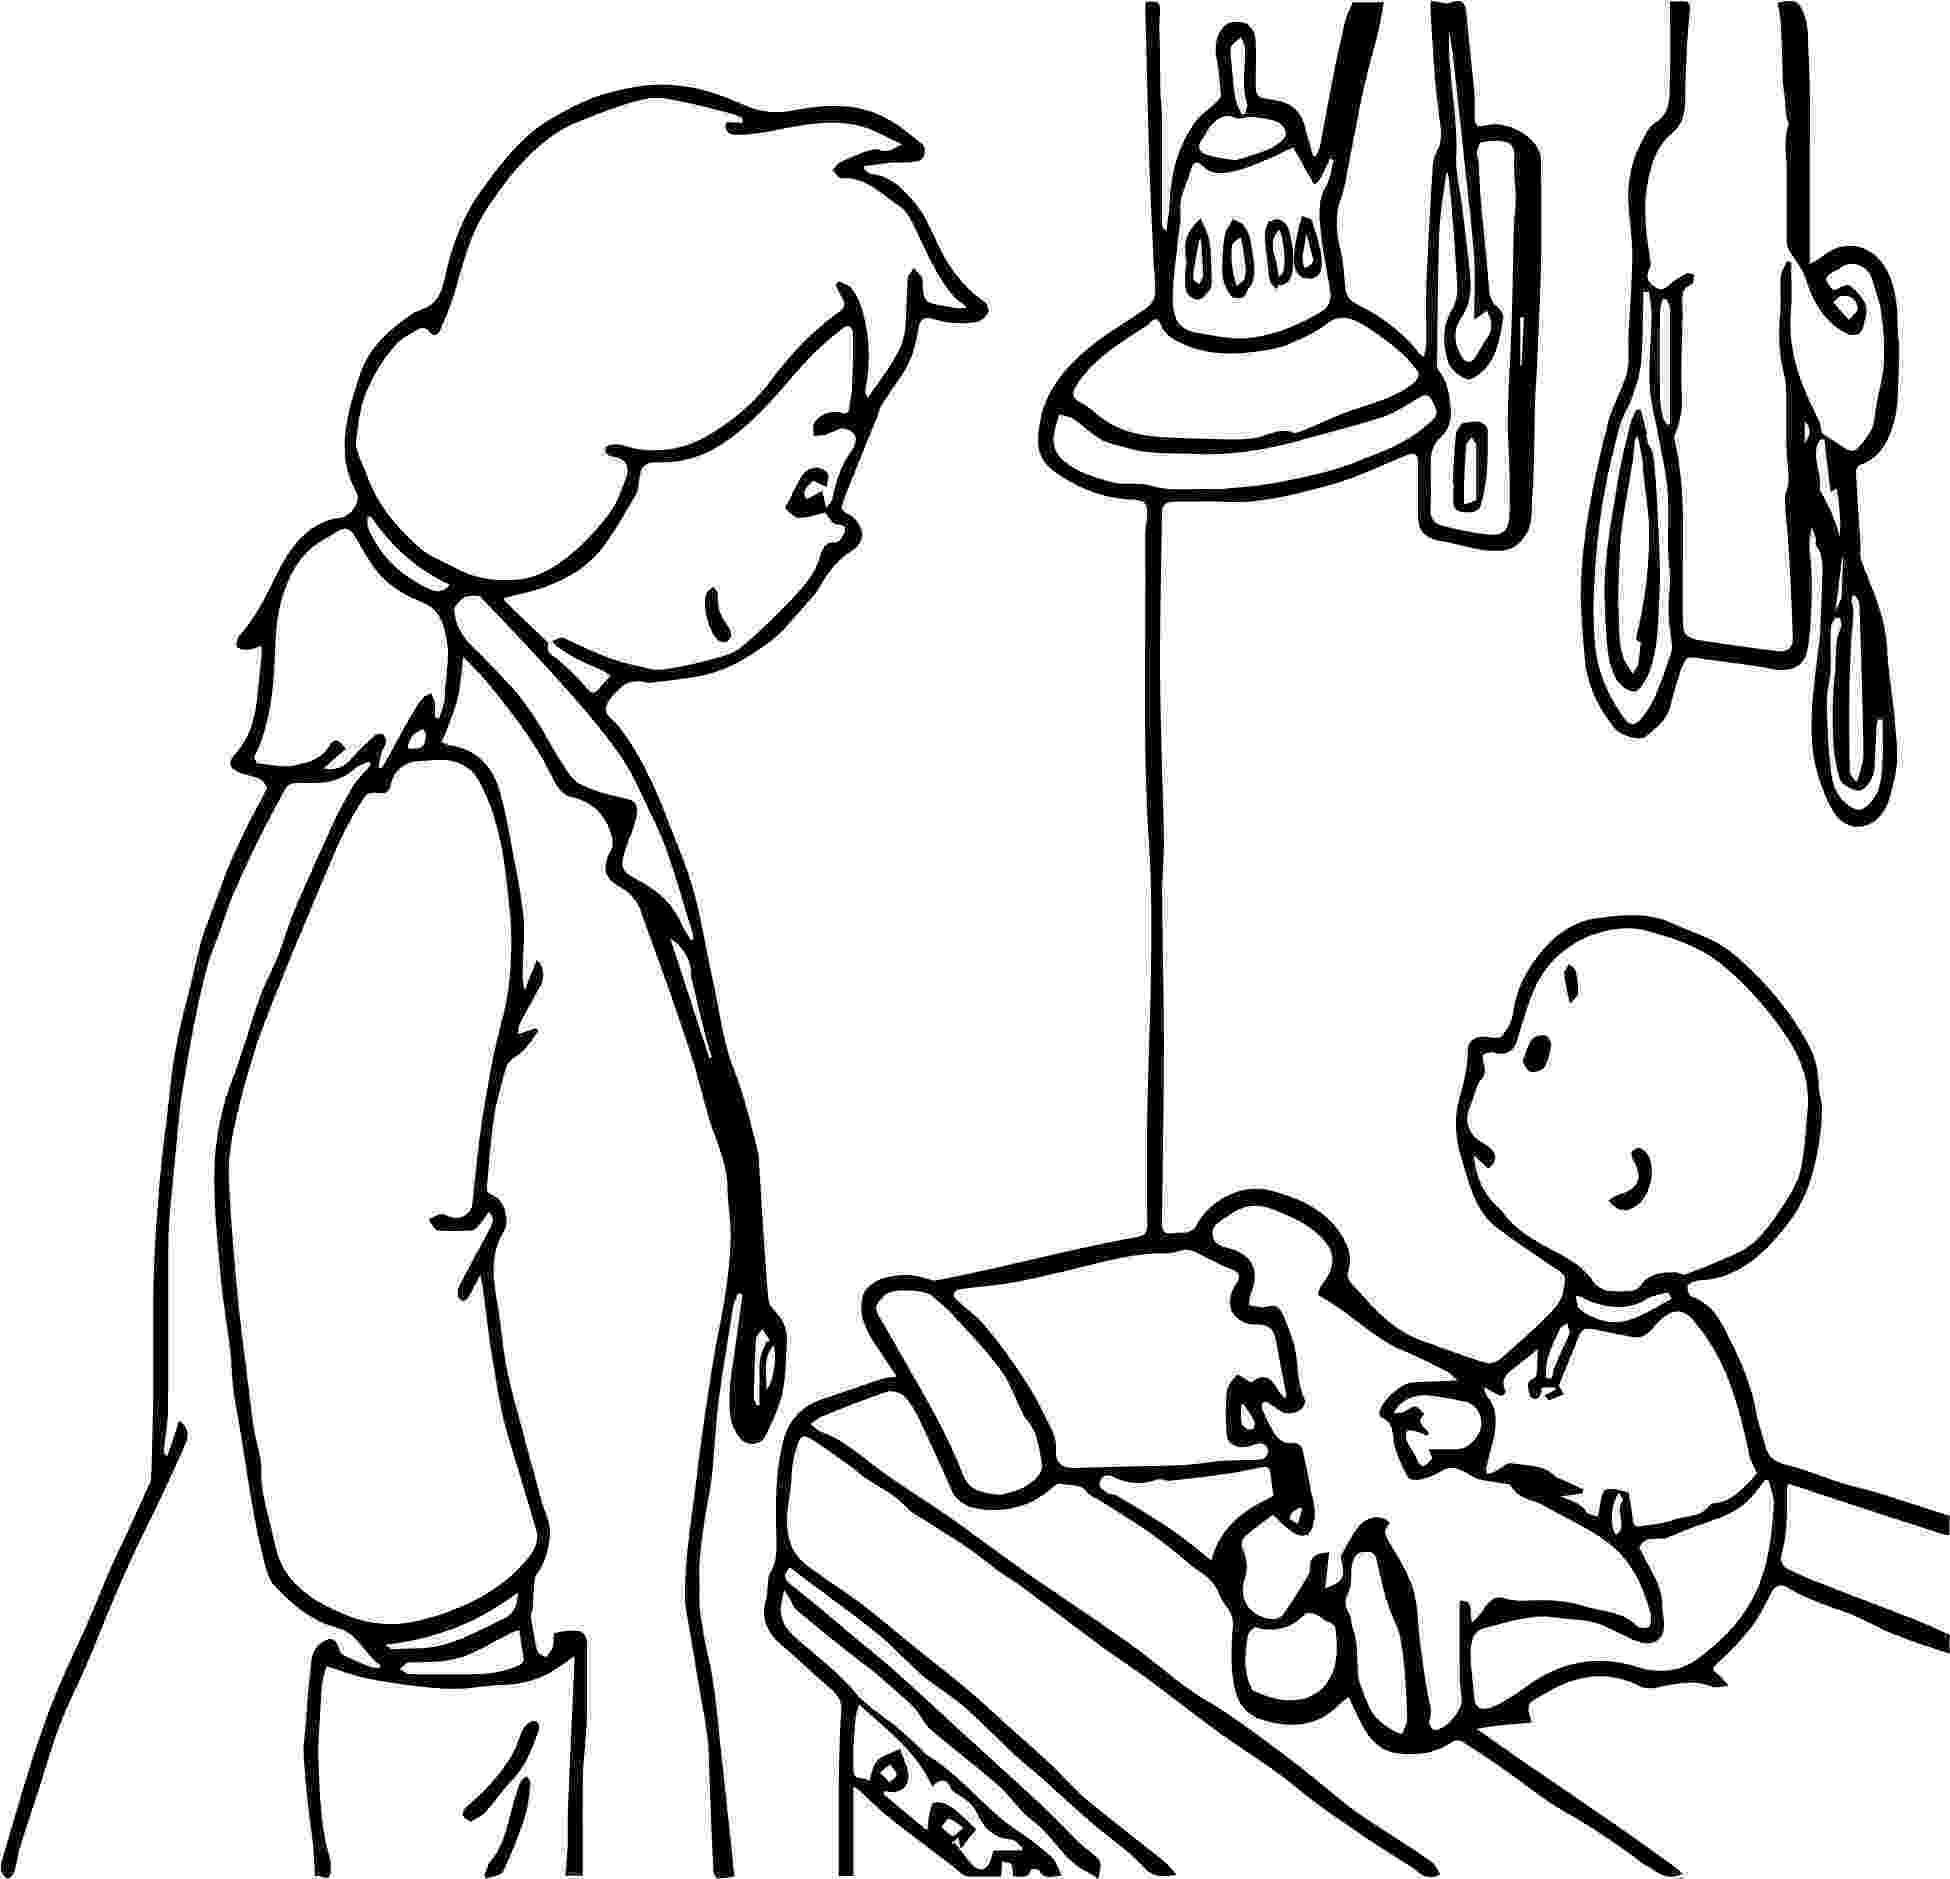 jesse owens coloring sheet sojourner truth coloring pages gallery coloring for kids coloring jesse sheet owens